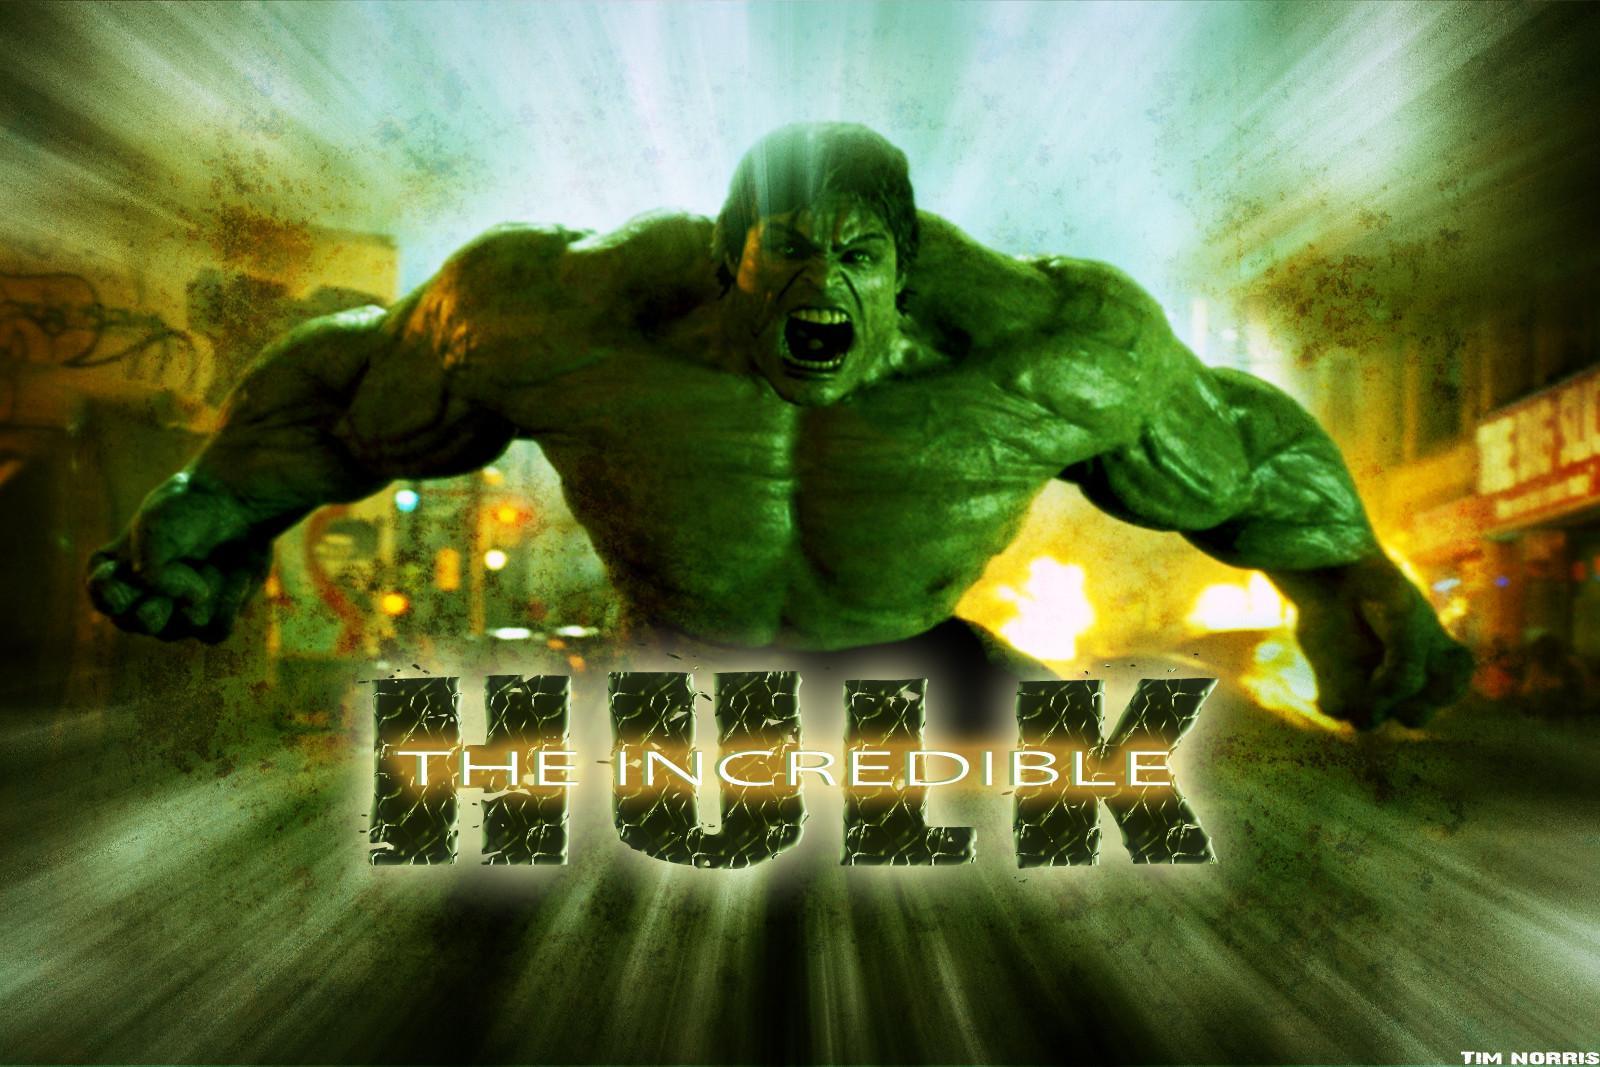 Hulk Wallpaper Desktop 4K FHDQ Images LLGL Wallpapers 1600x1067